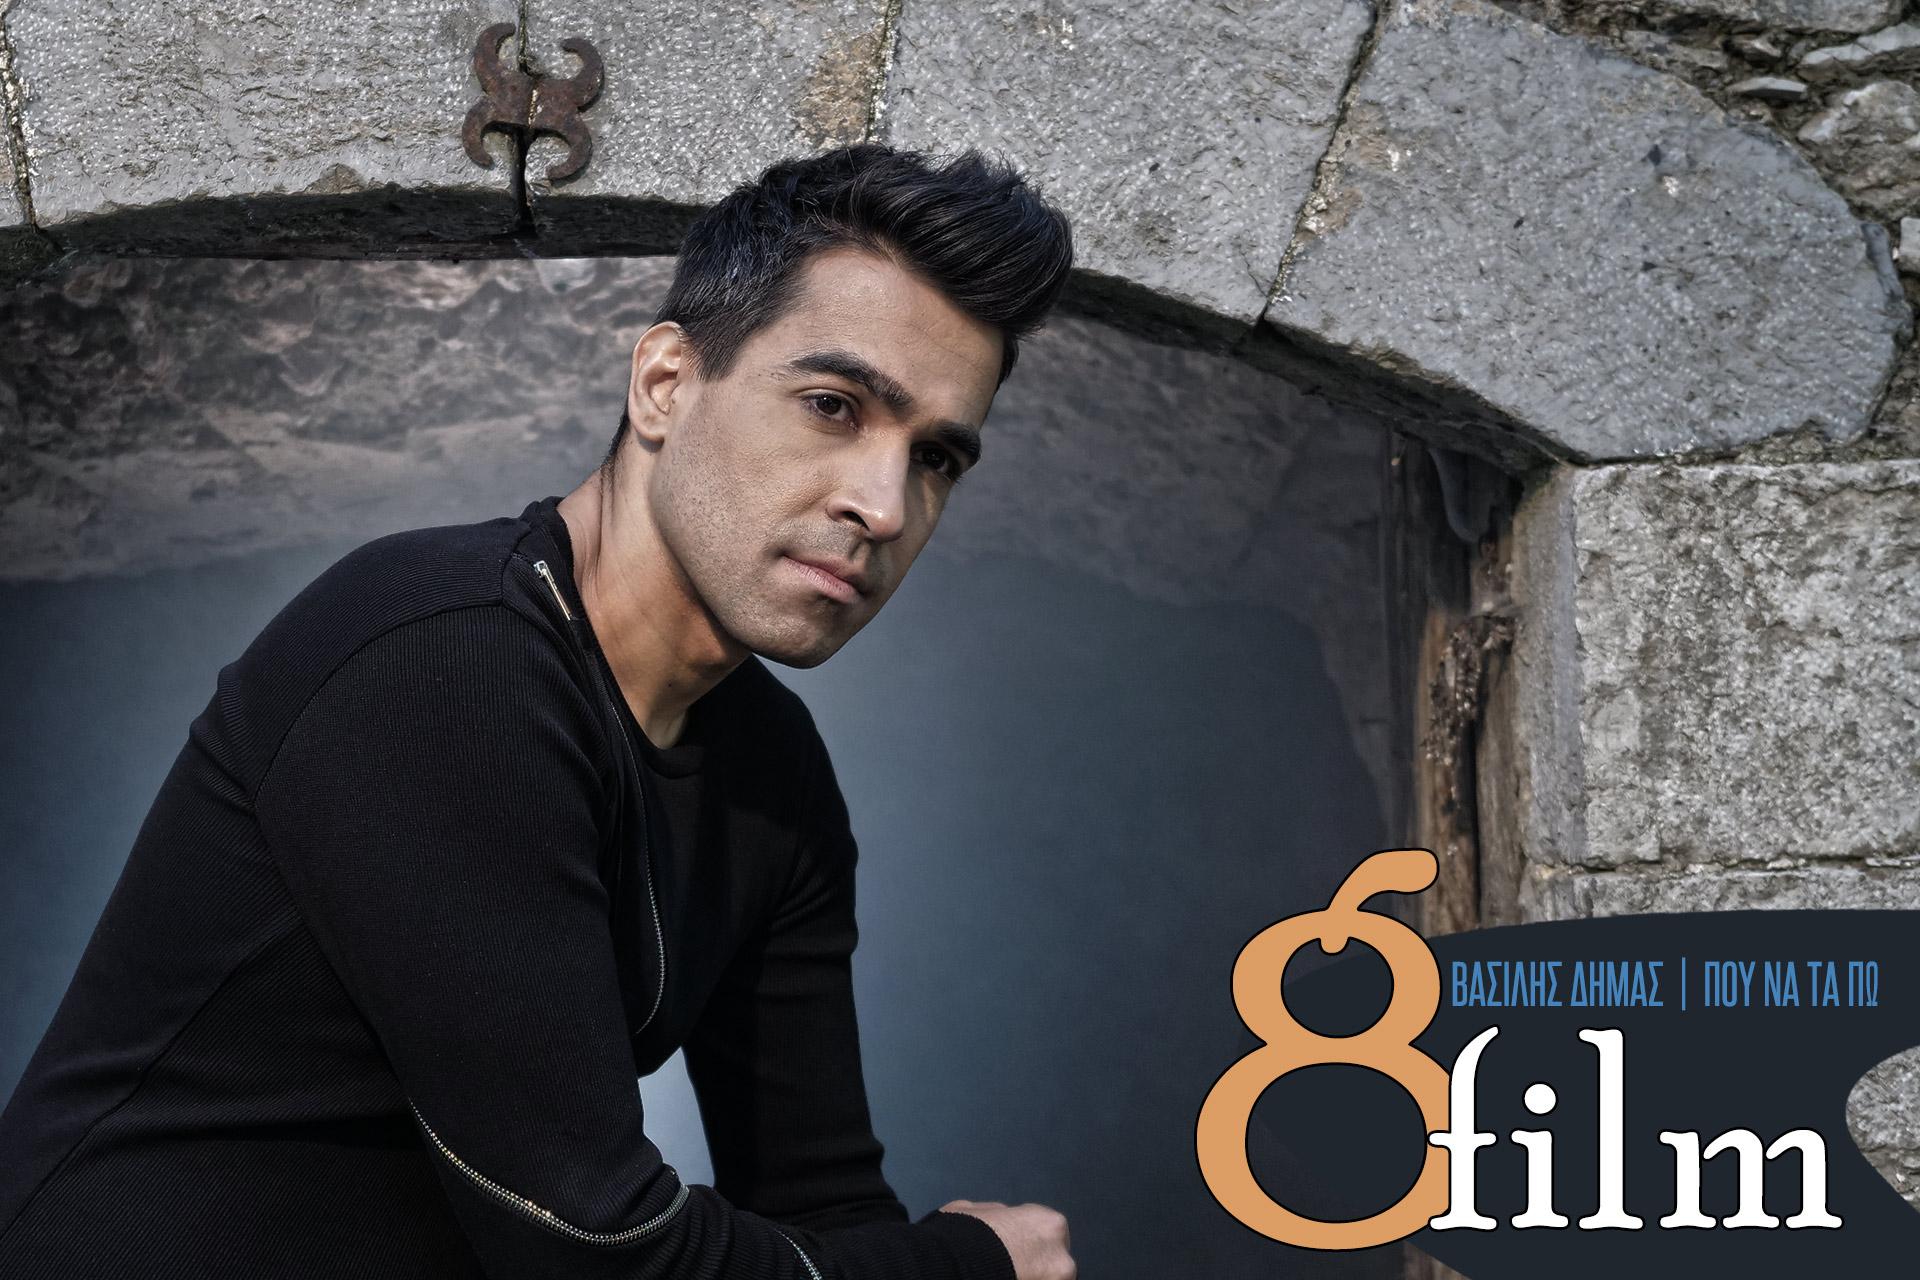 Vasilis-Dimas-Poy-na-ta-po-videoclip-8filmproductions